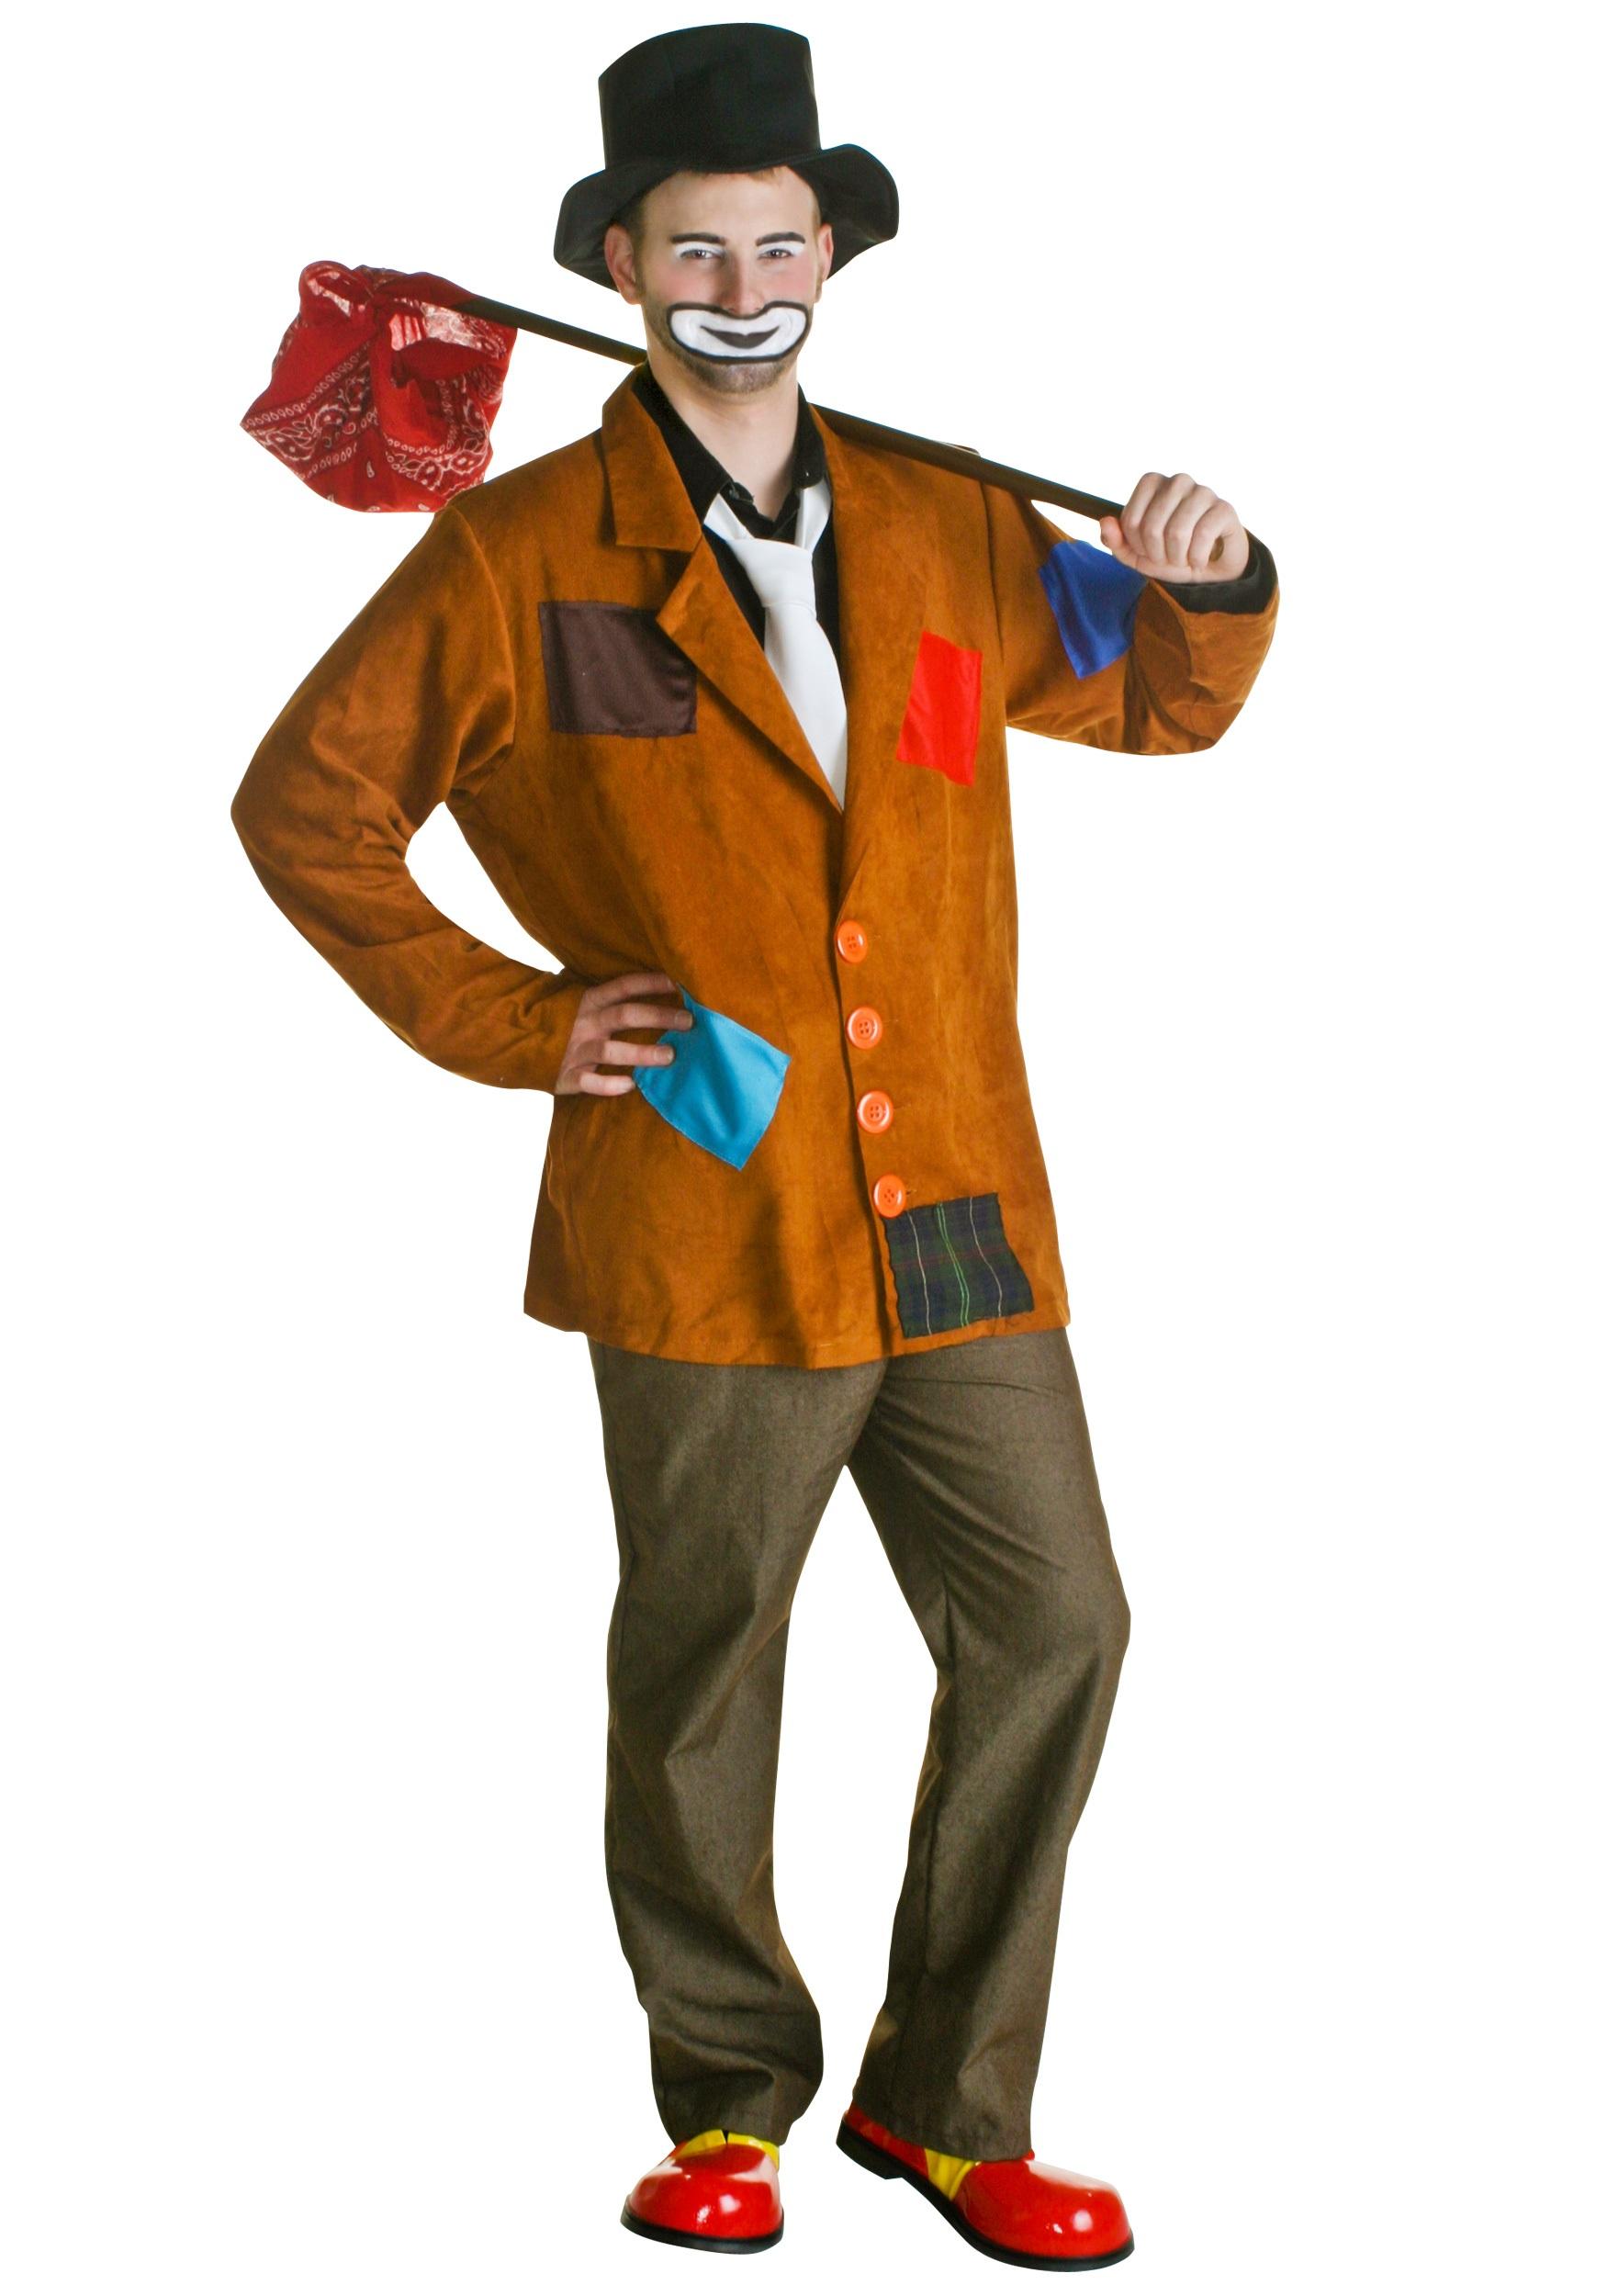 Adult Hobo Clown Costume  sc 1 st  Halloween Costumes & Adult Hobo Clown Costume - Halloween Costumes